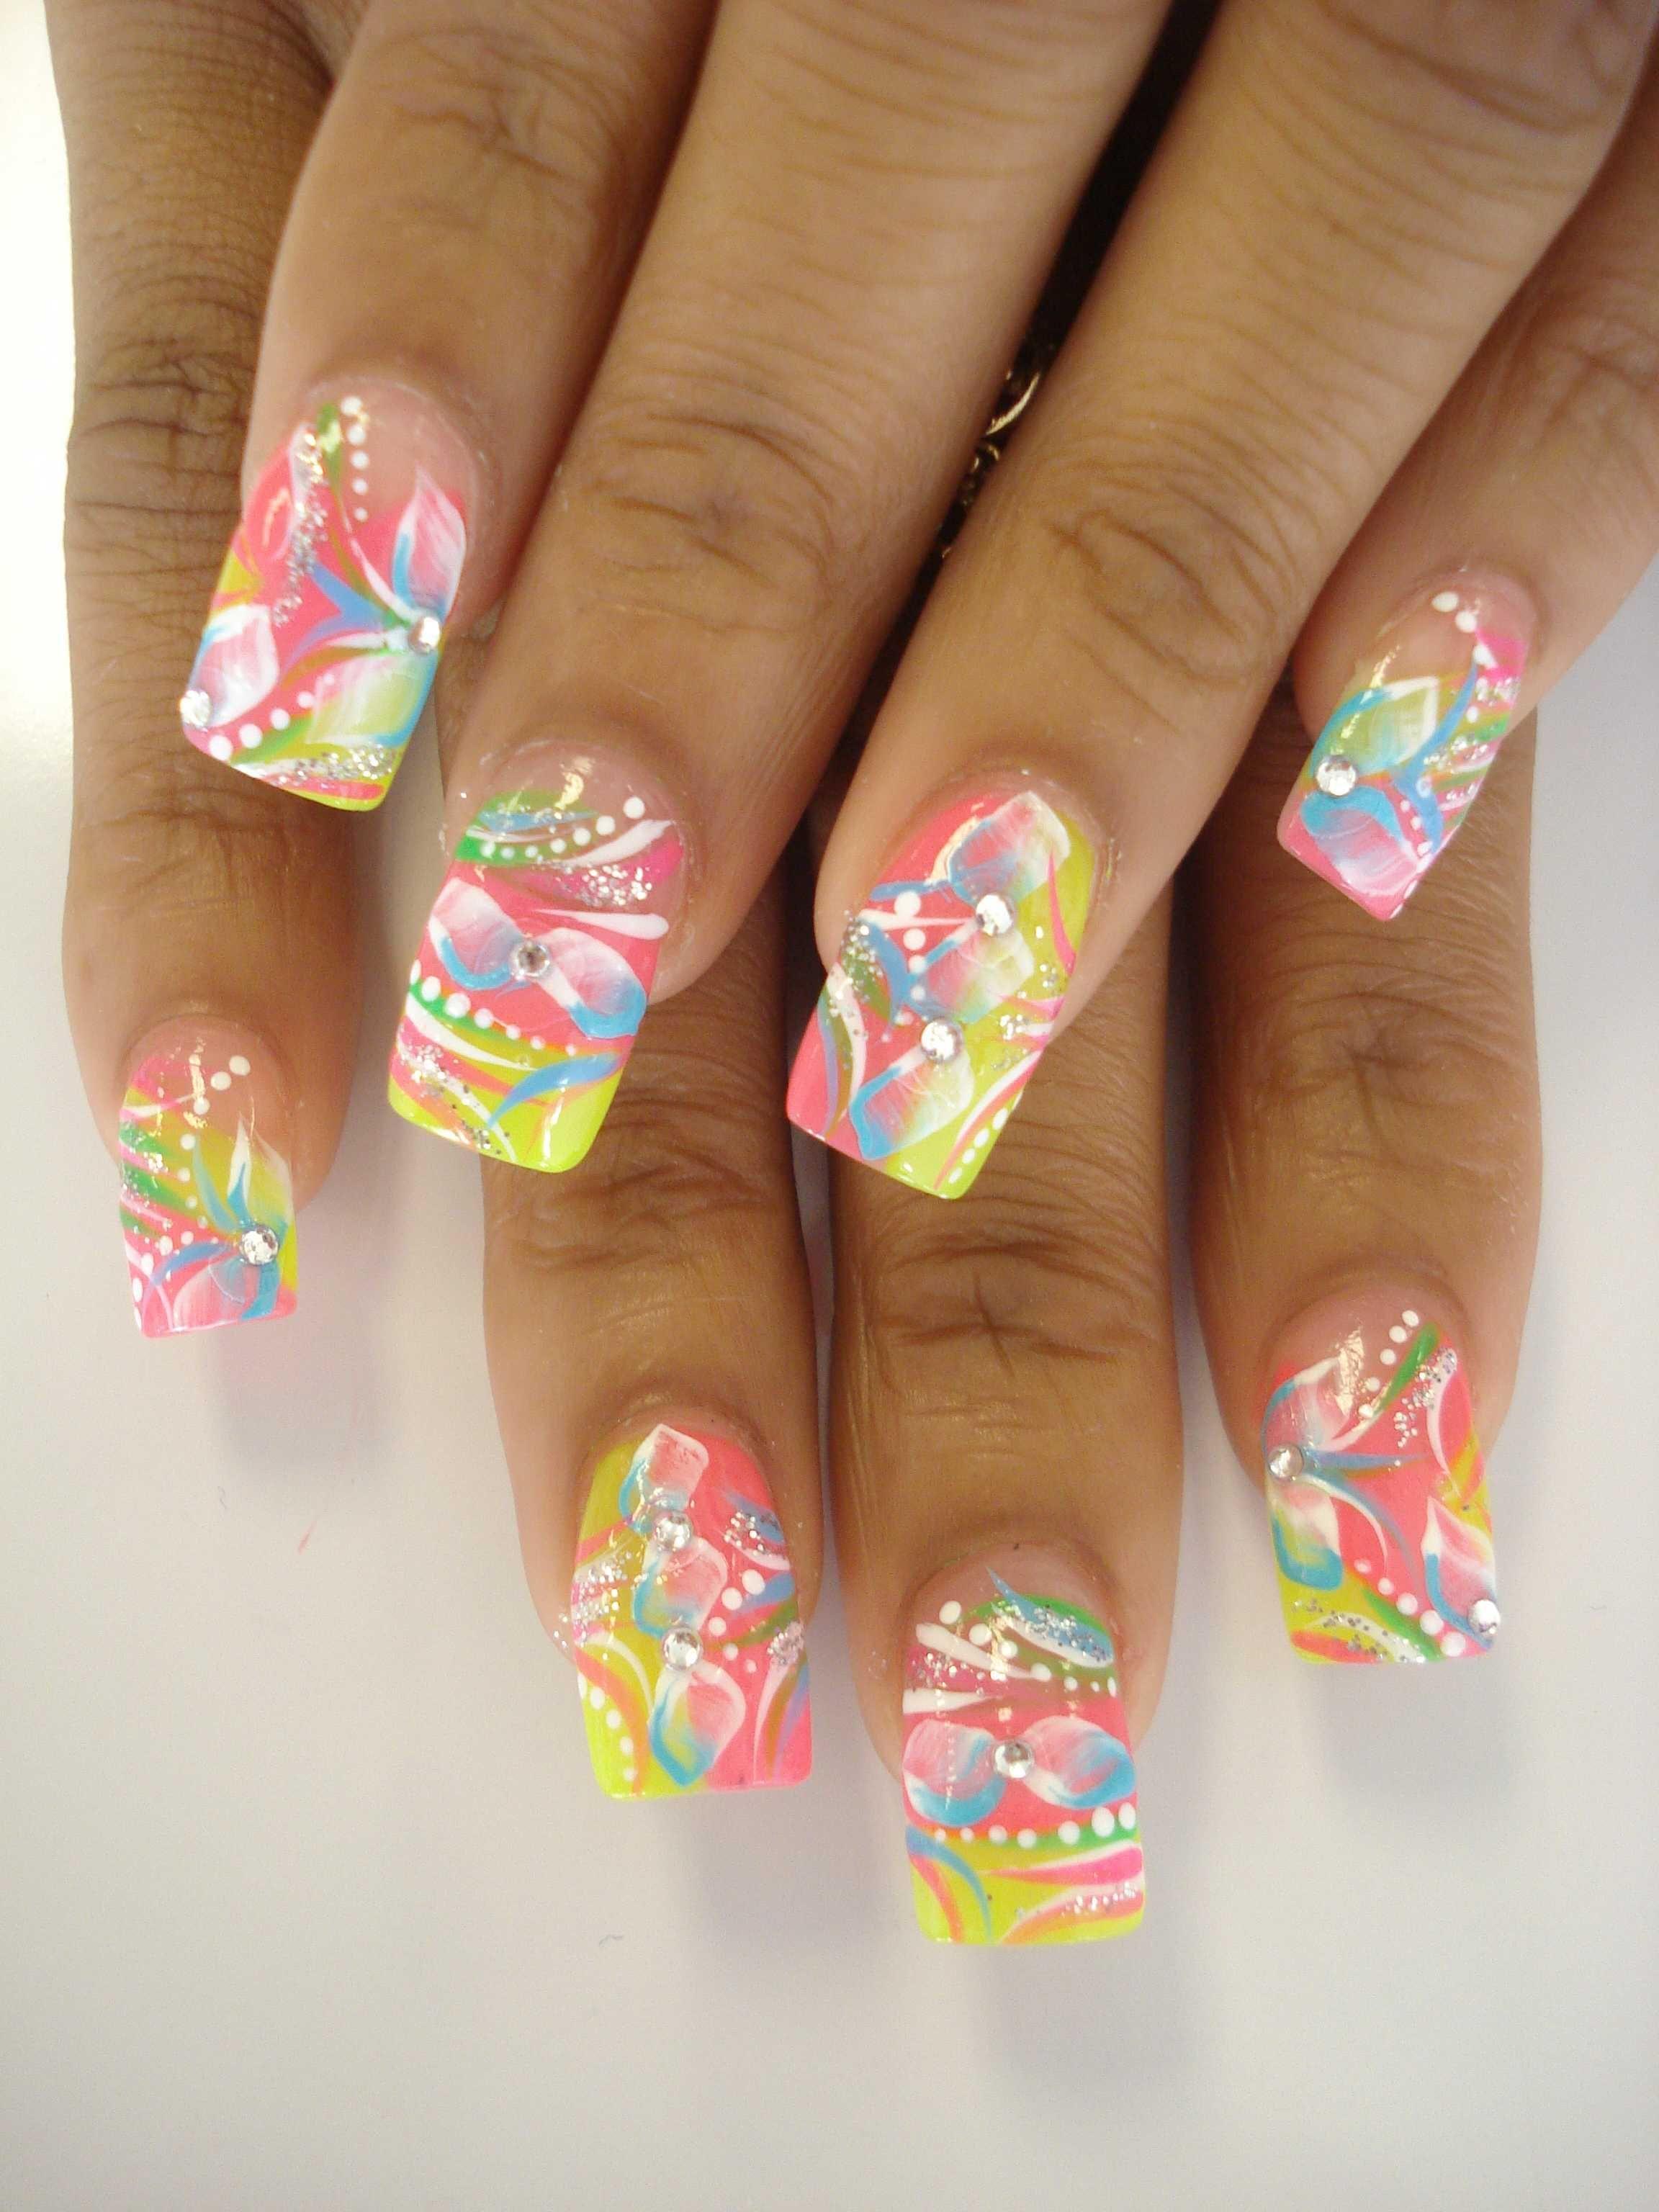 Acrylic French Tip Nail Designs ... | Nail Designs | Pinterest ...